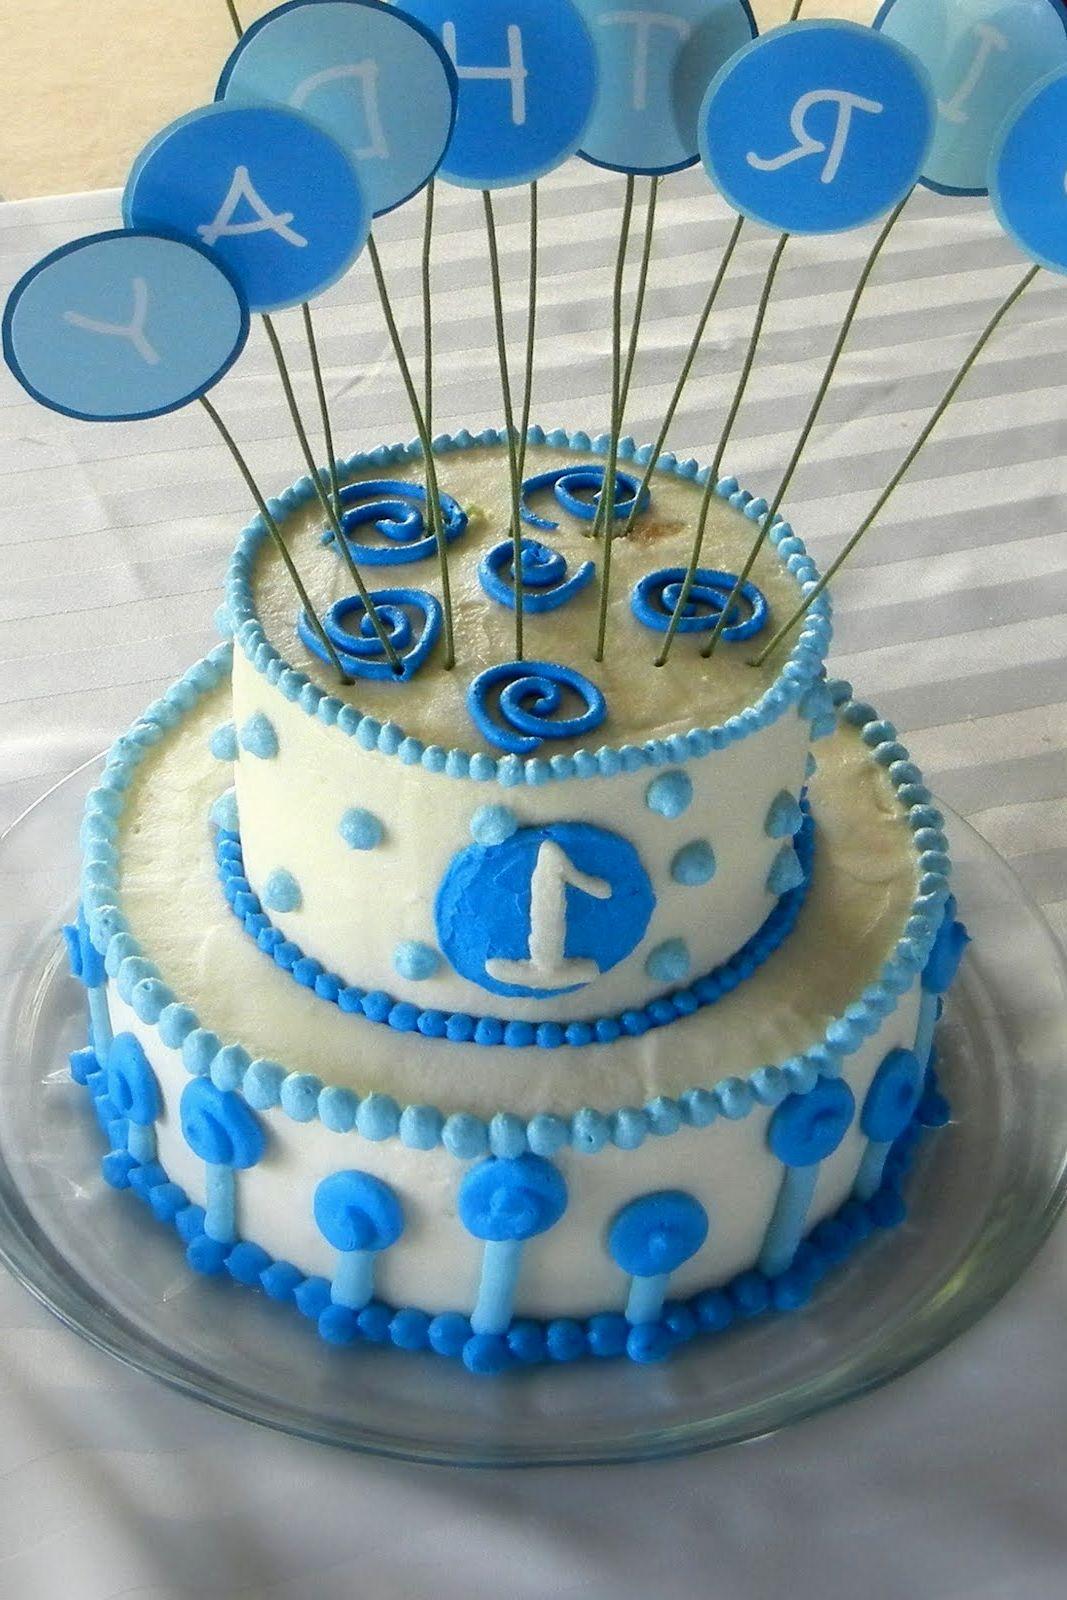 Boys First Birthday Cake 10 Simple Cakes For Ba Boy Photo Easy